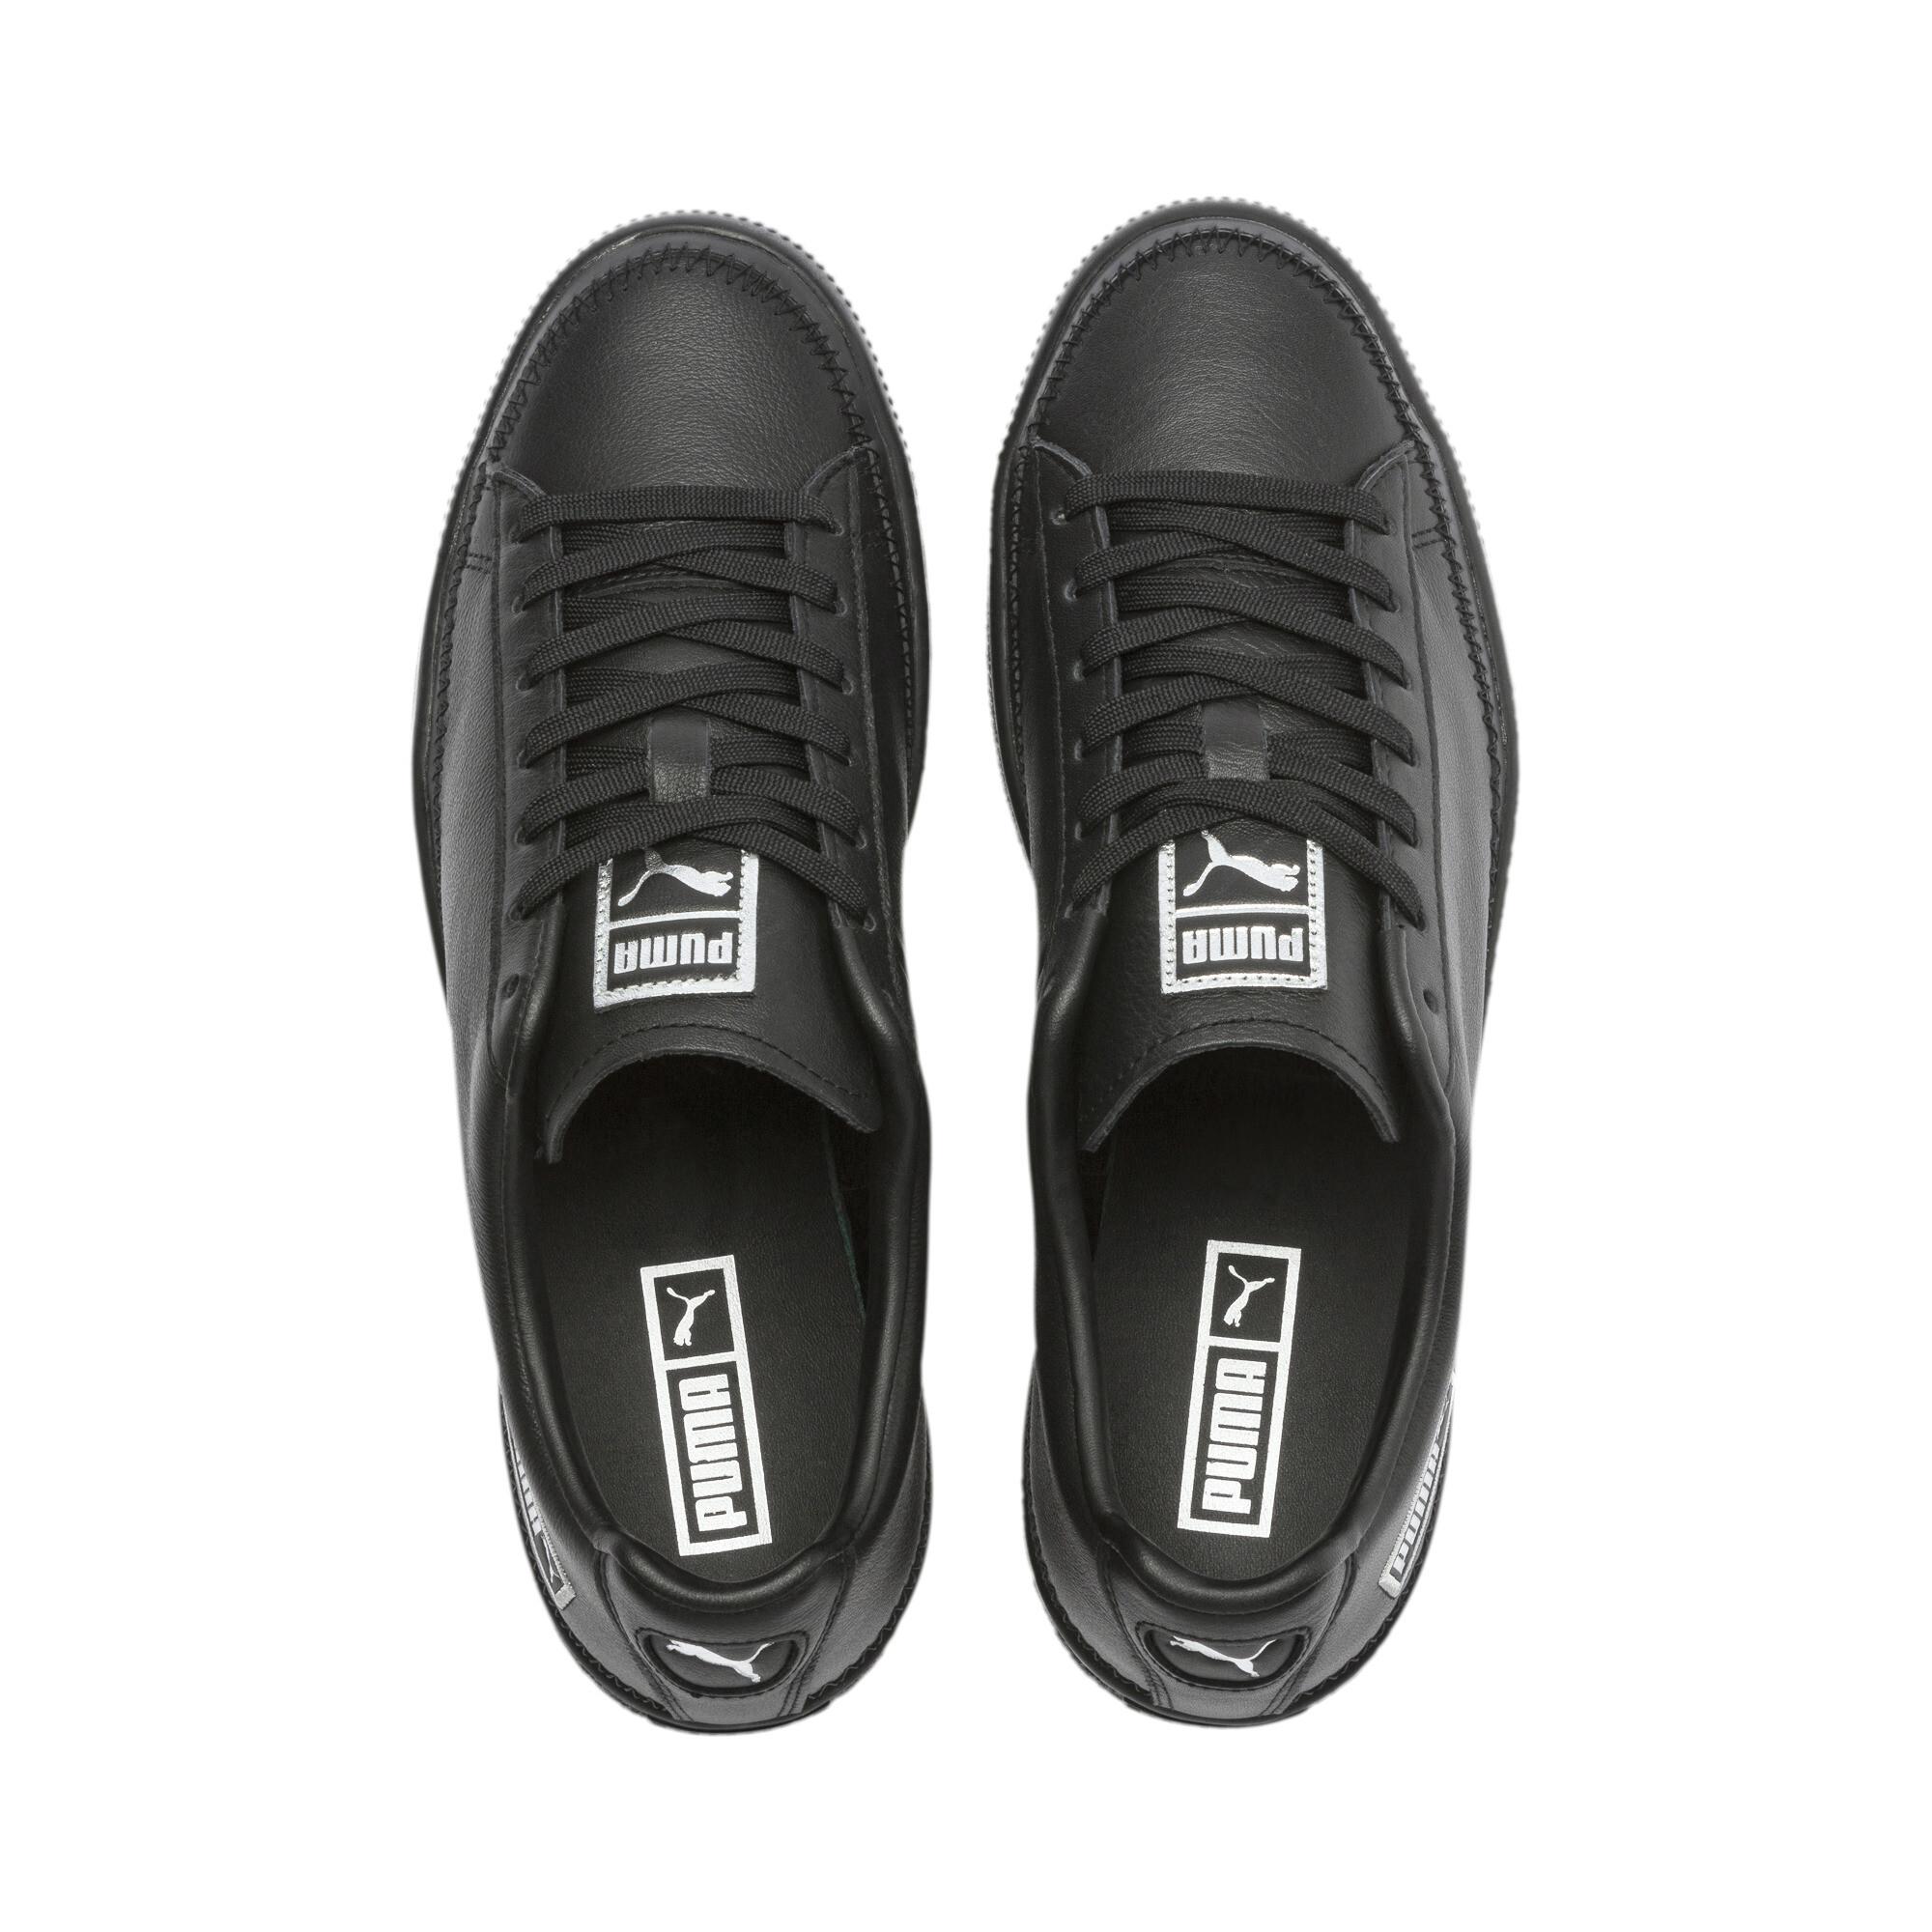 Indexbild 19 - PUMA Basket Stitch Sneaker Unisex Schuhe Neu